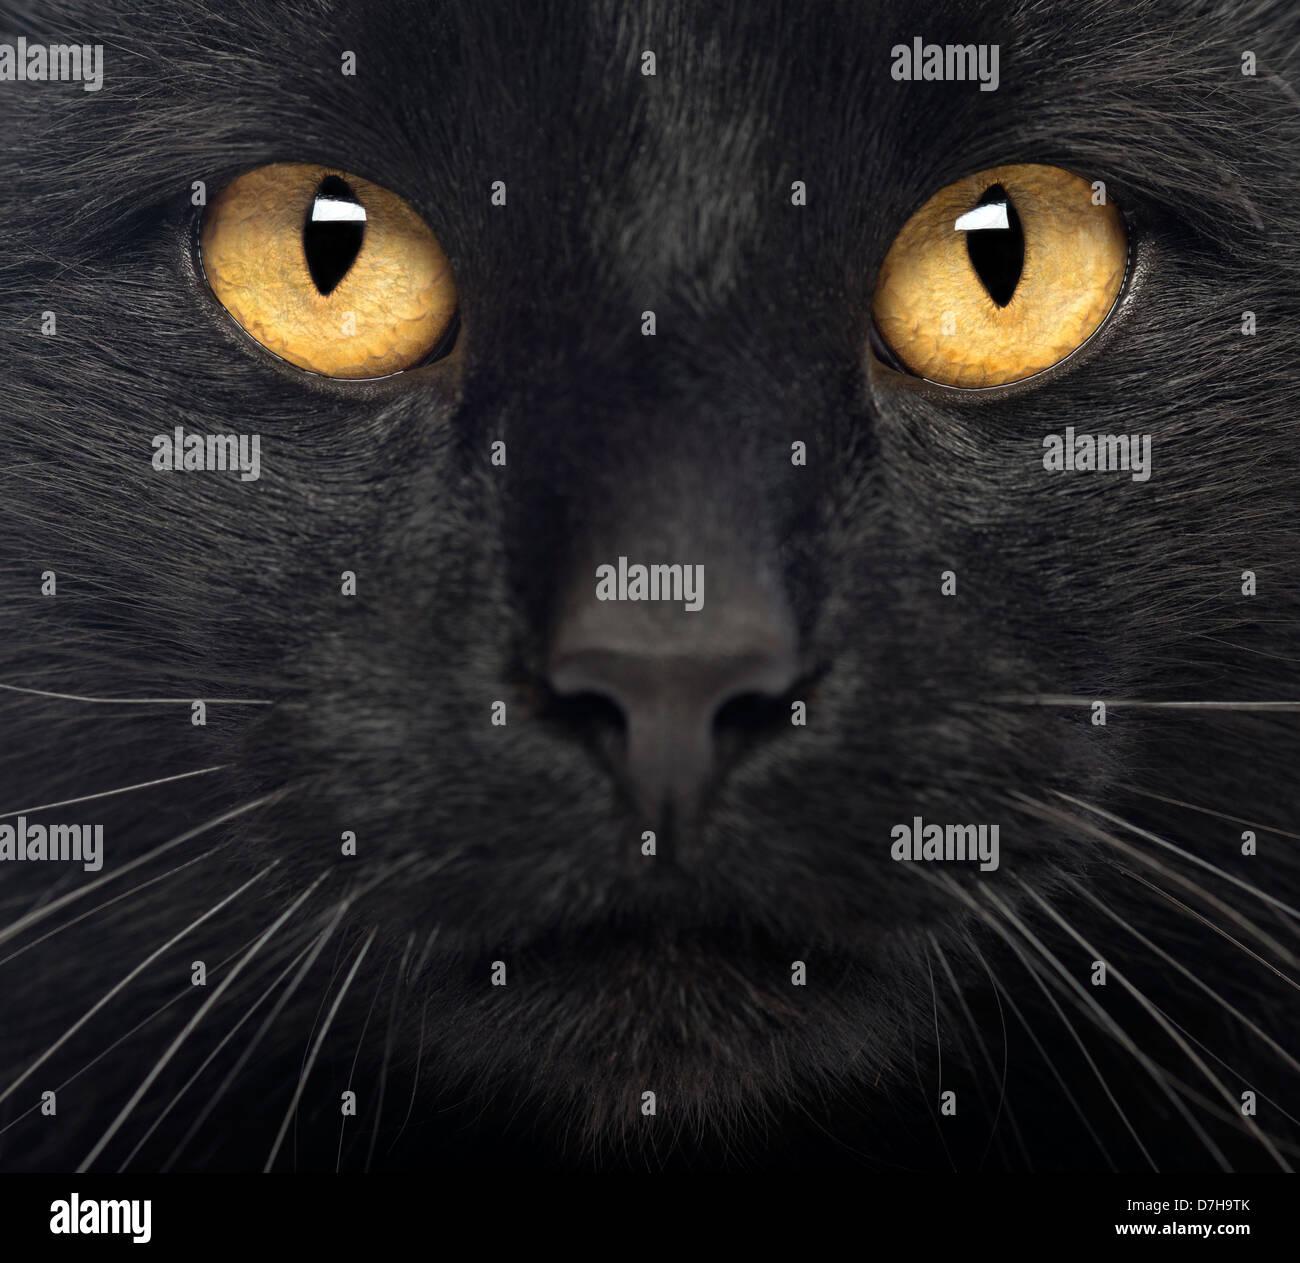 Close-up of a Black Cat looking at camera - Stock Image